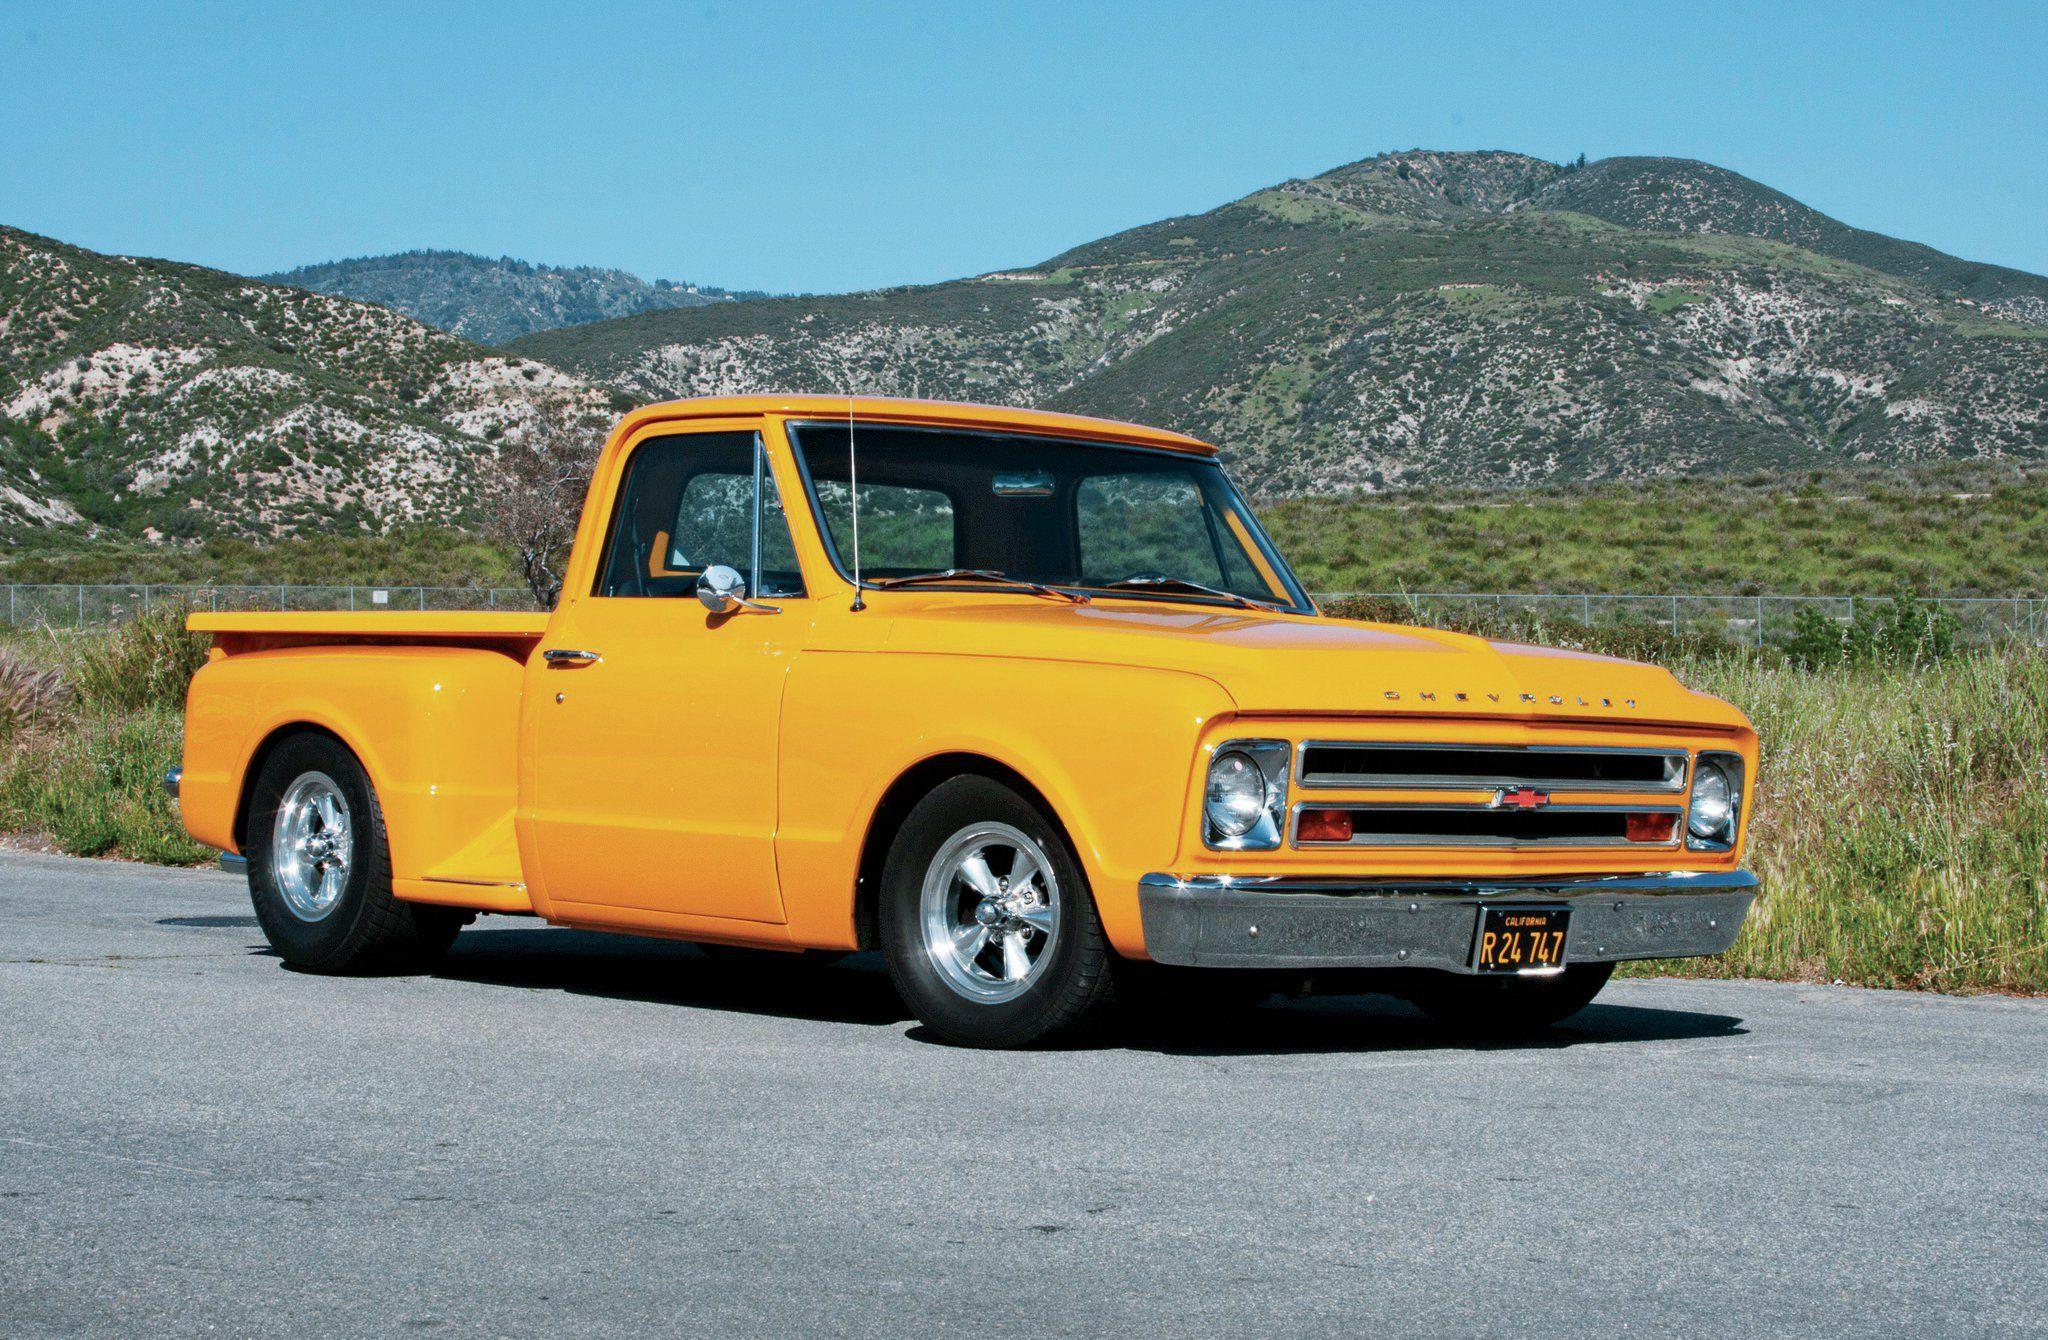 67 Chevy Truck Fuse Box Wiring Diagram Portal 69 C10 1967 Stepside Gm 68 Pinterest Rh Co Uk 1977 1979